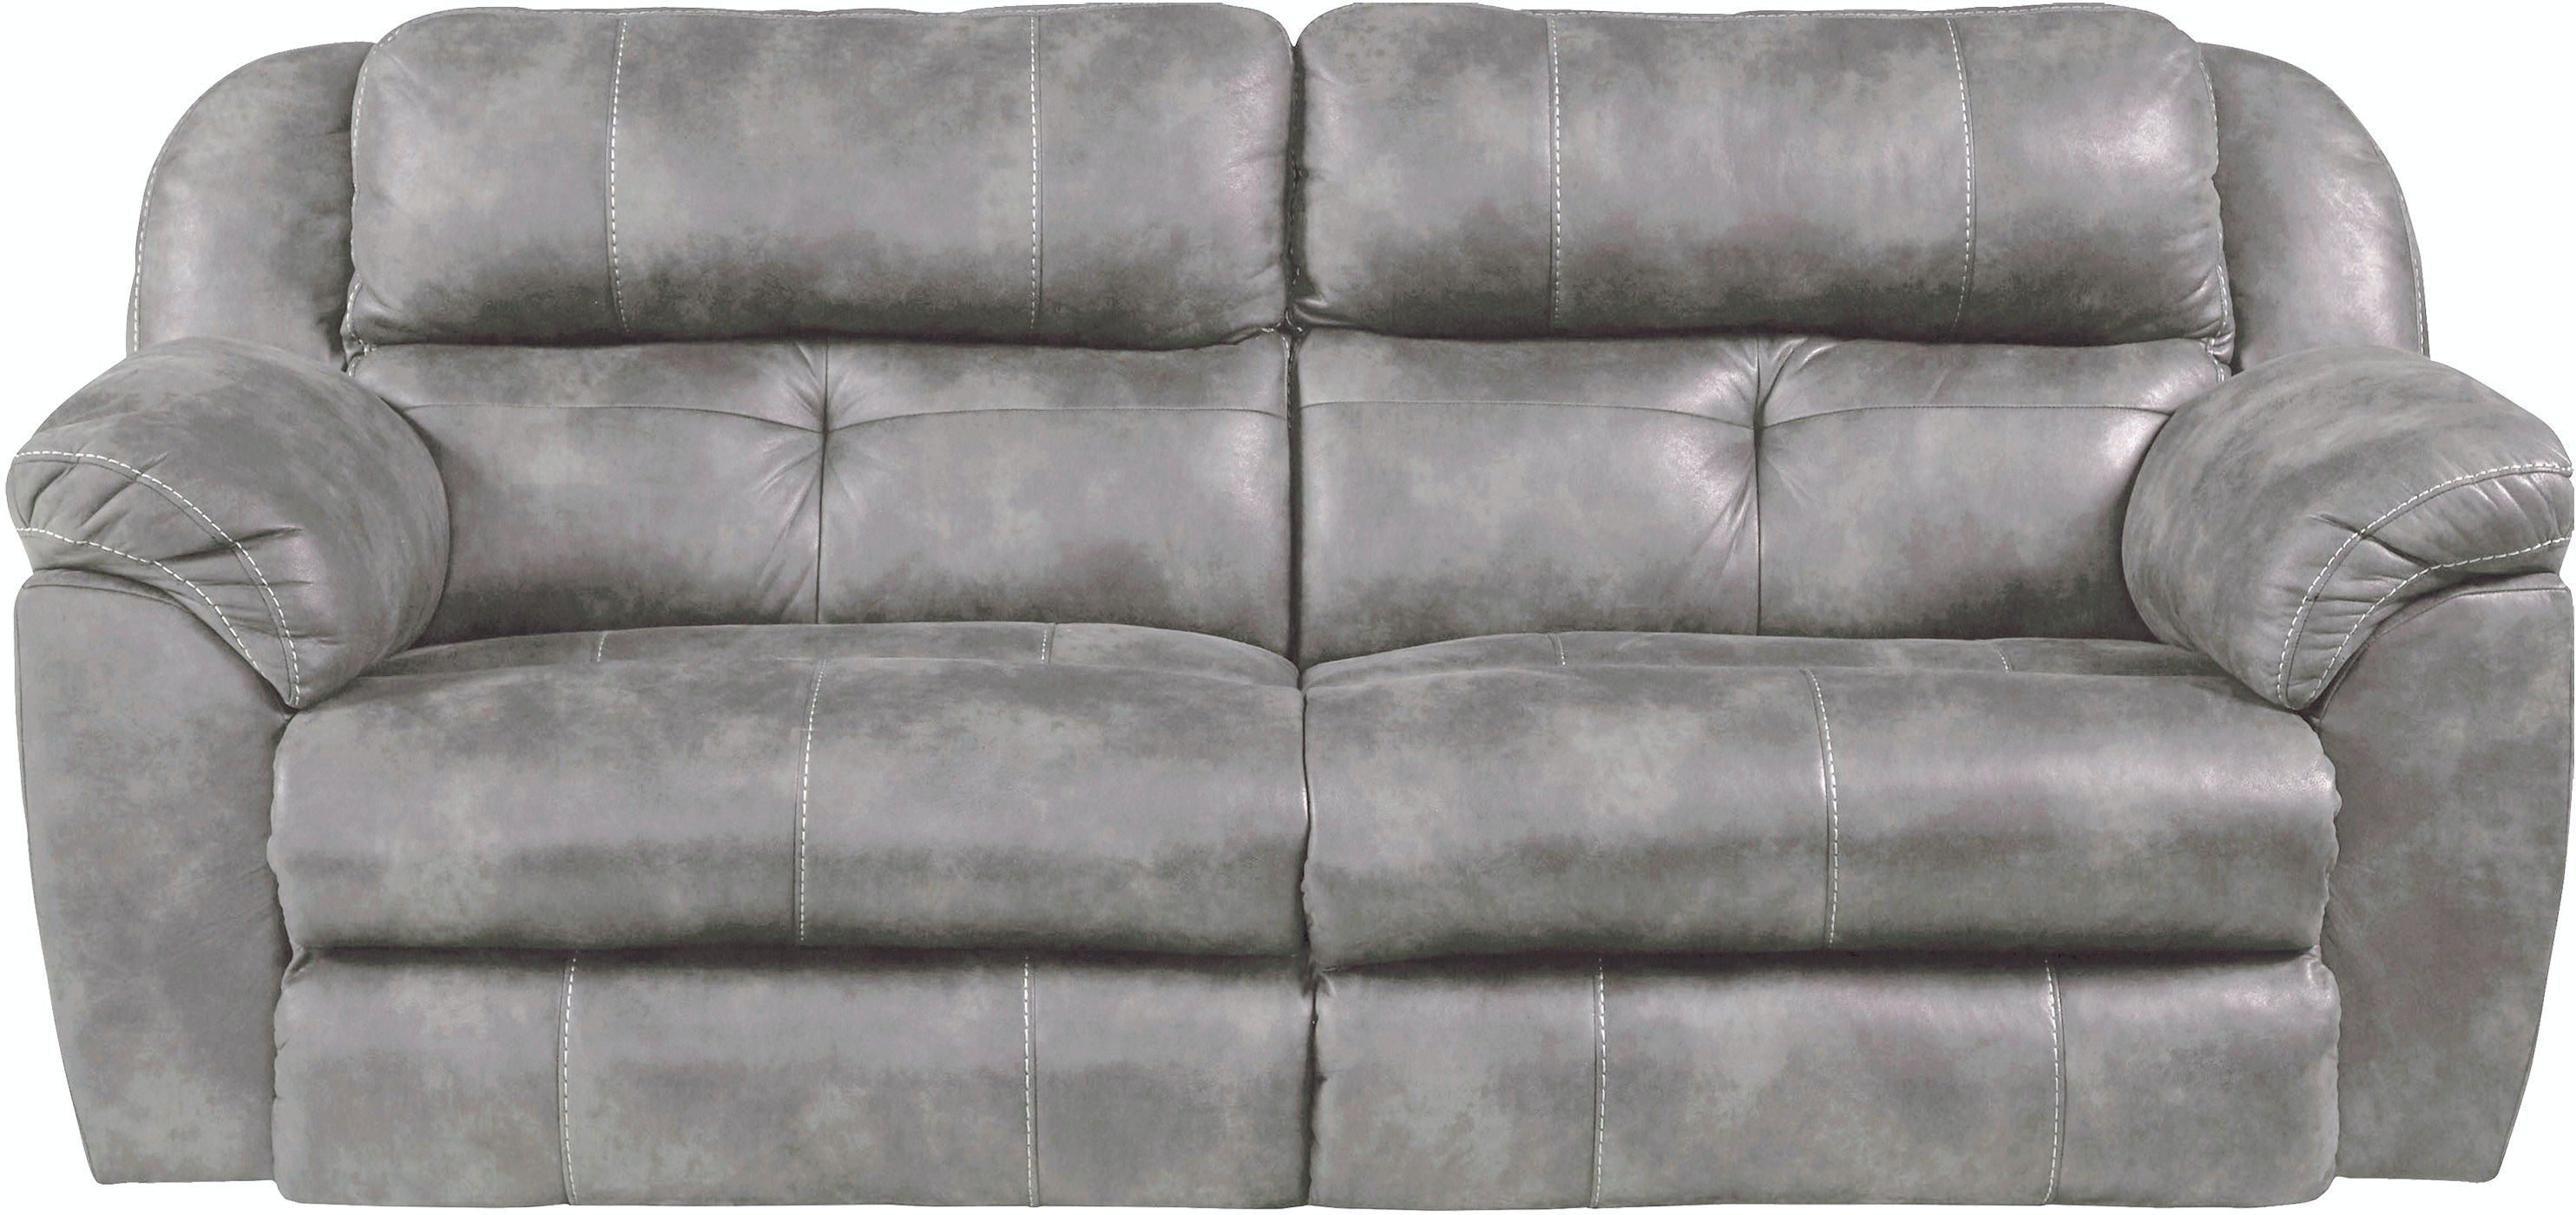 Catnapper Furniture Living Room Power Headrest Power Lay Flat